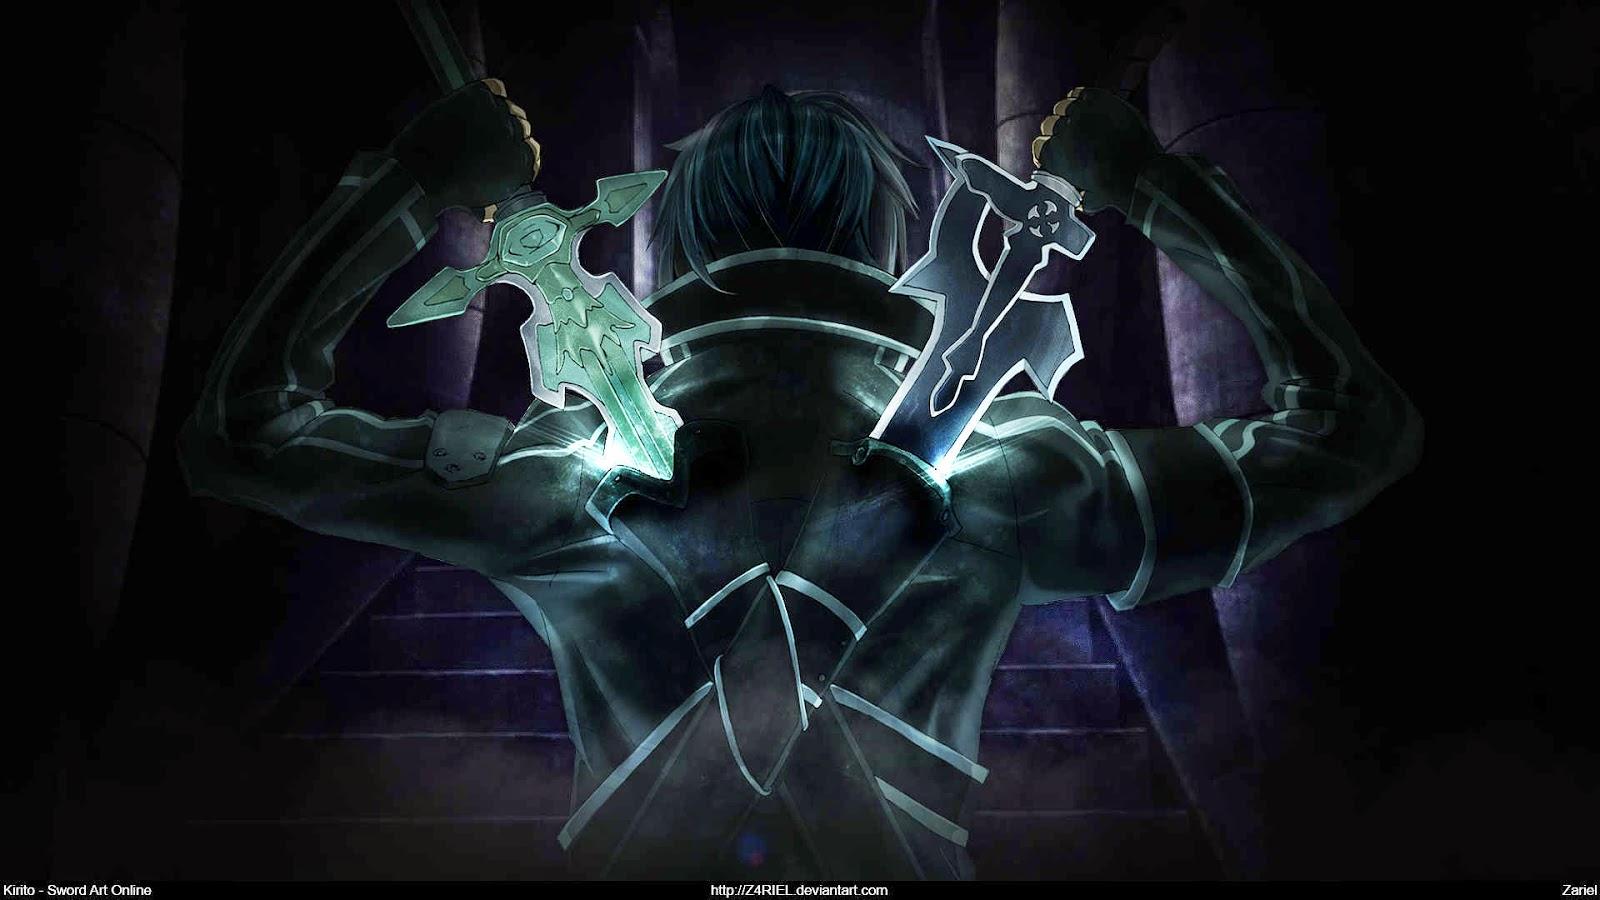 Kirito Sword Art Wallpaper Hd Wallpaper And Desktop Background